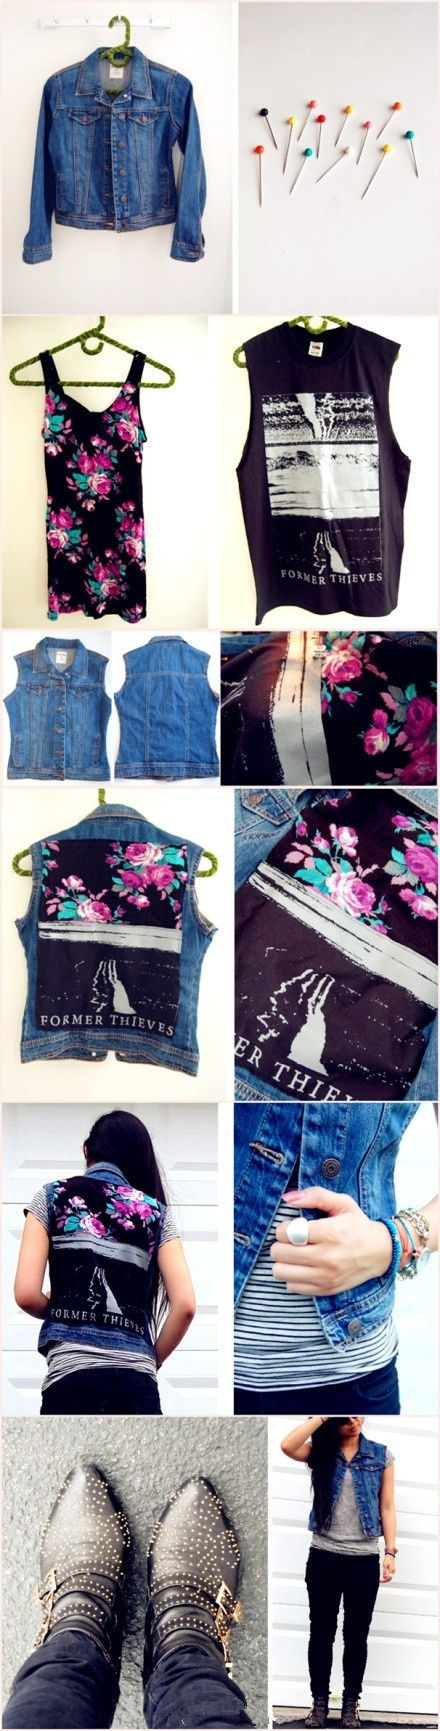 jeans chaleco11